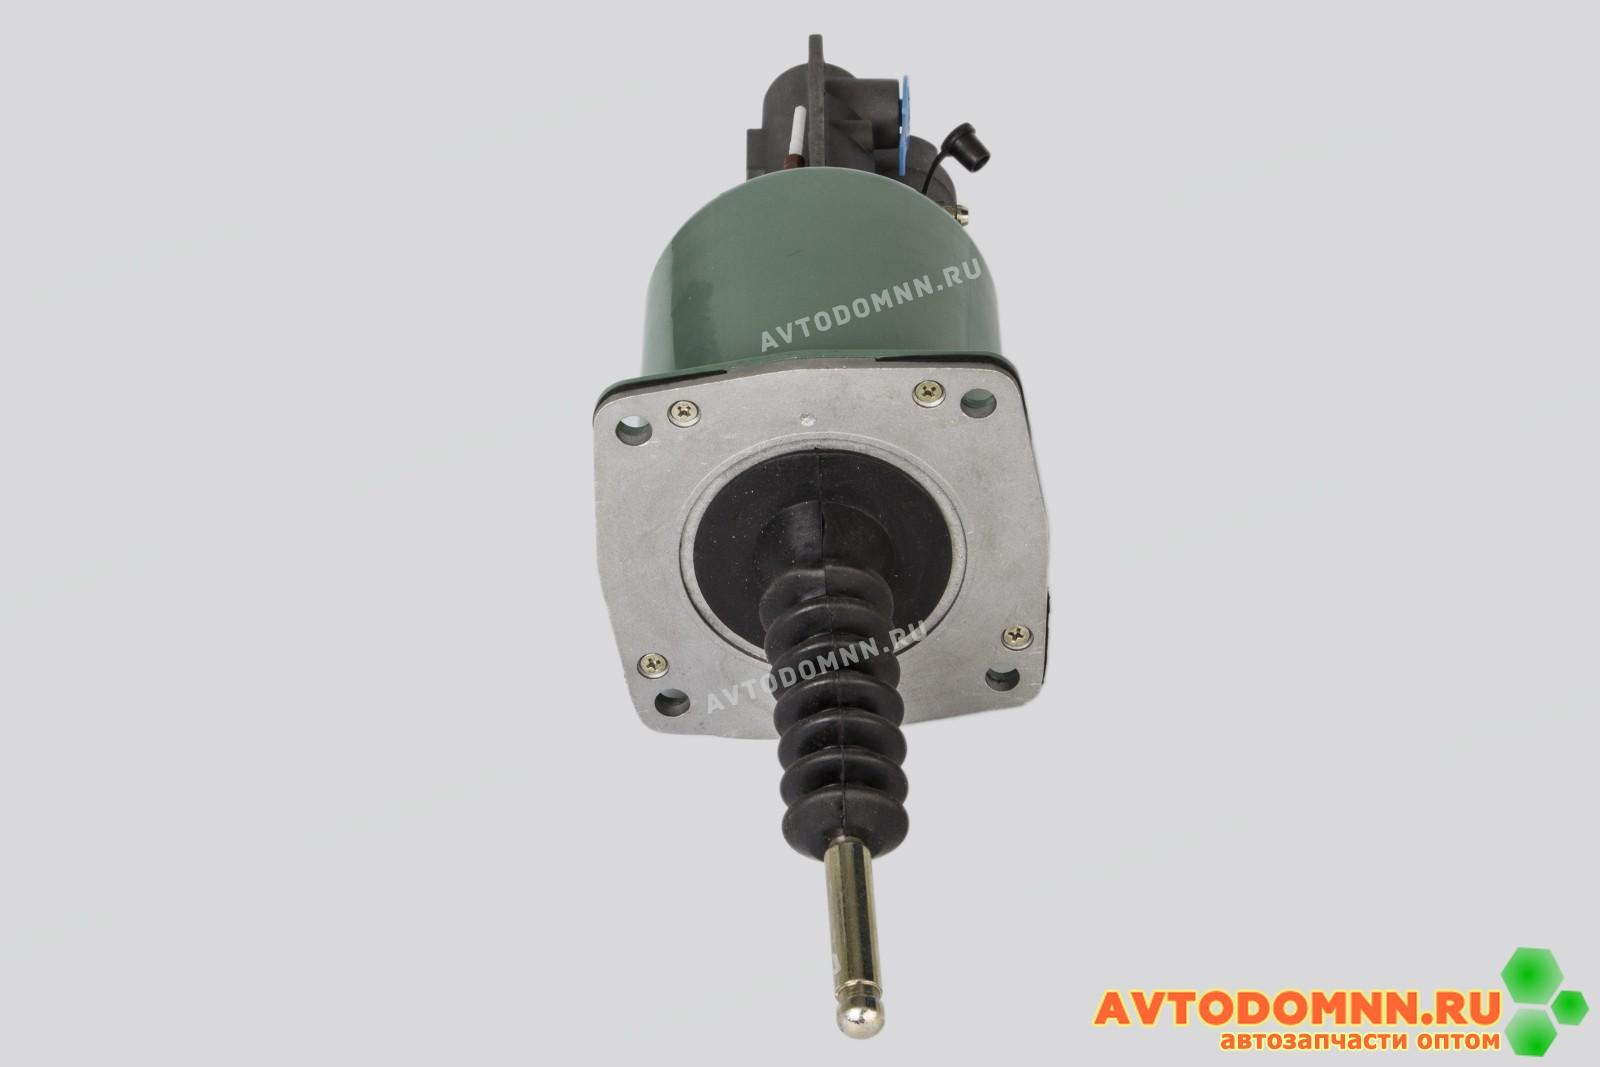 VG-3261 ПГУ (Пневмогидроусилитель) МАЗ, МАН (аналог Knorr Bremse)